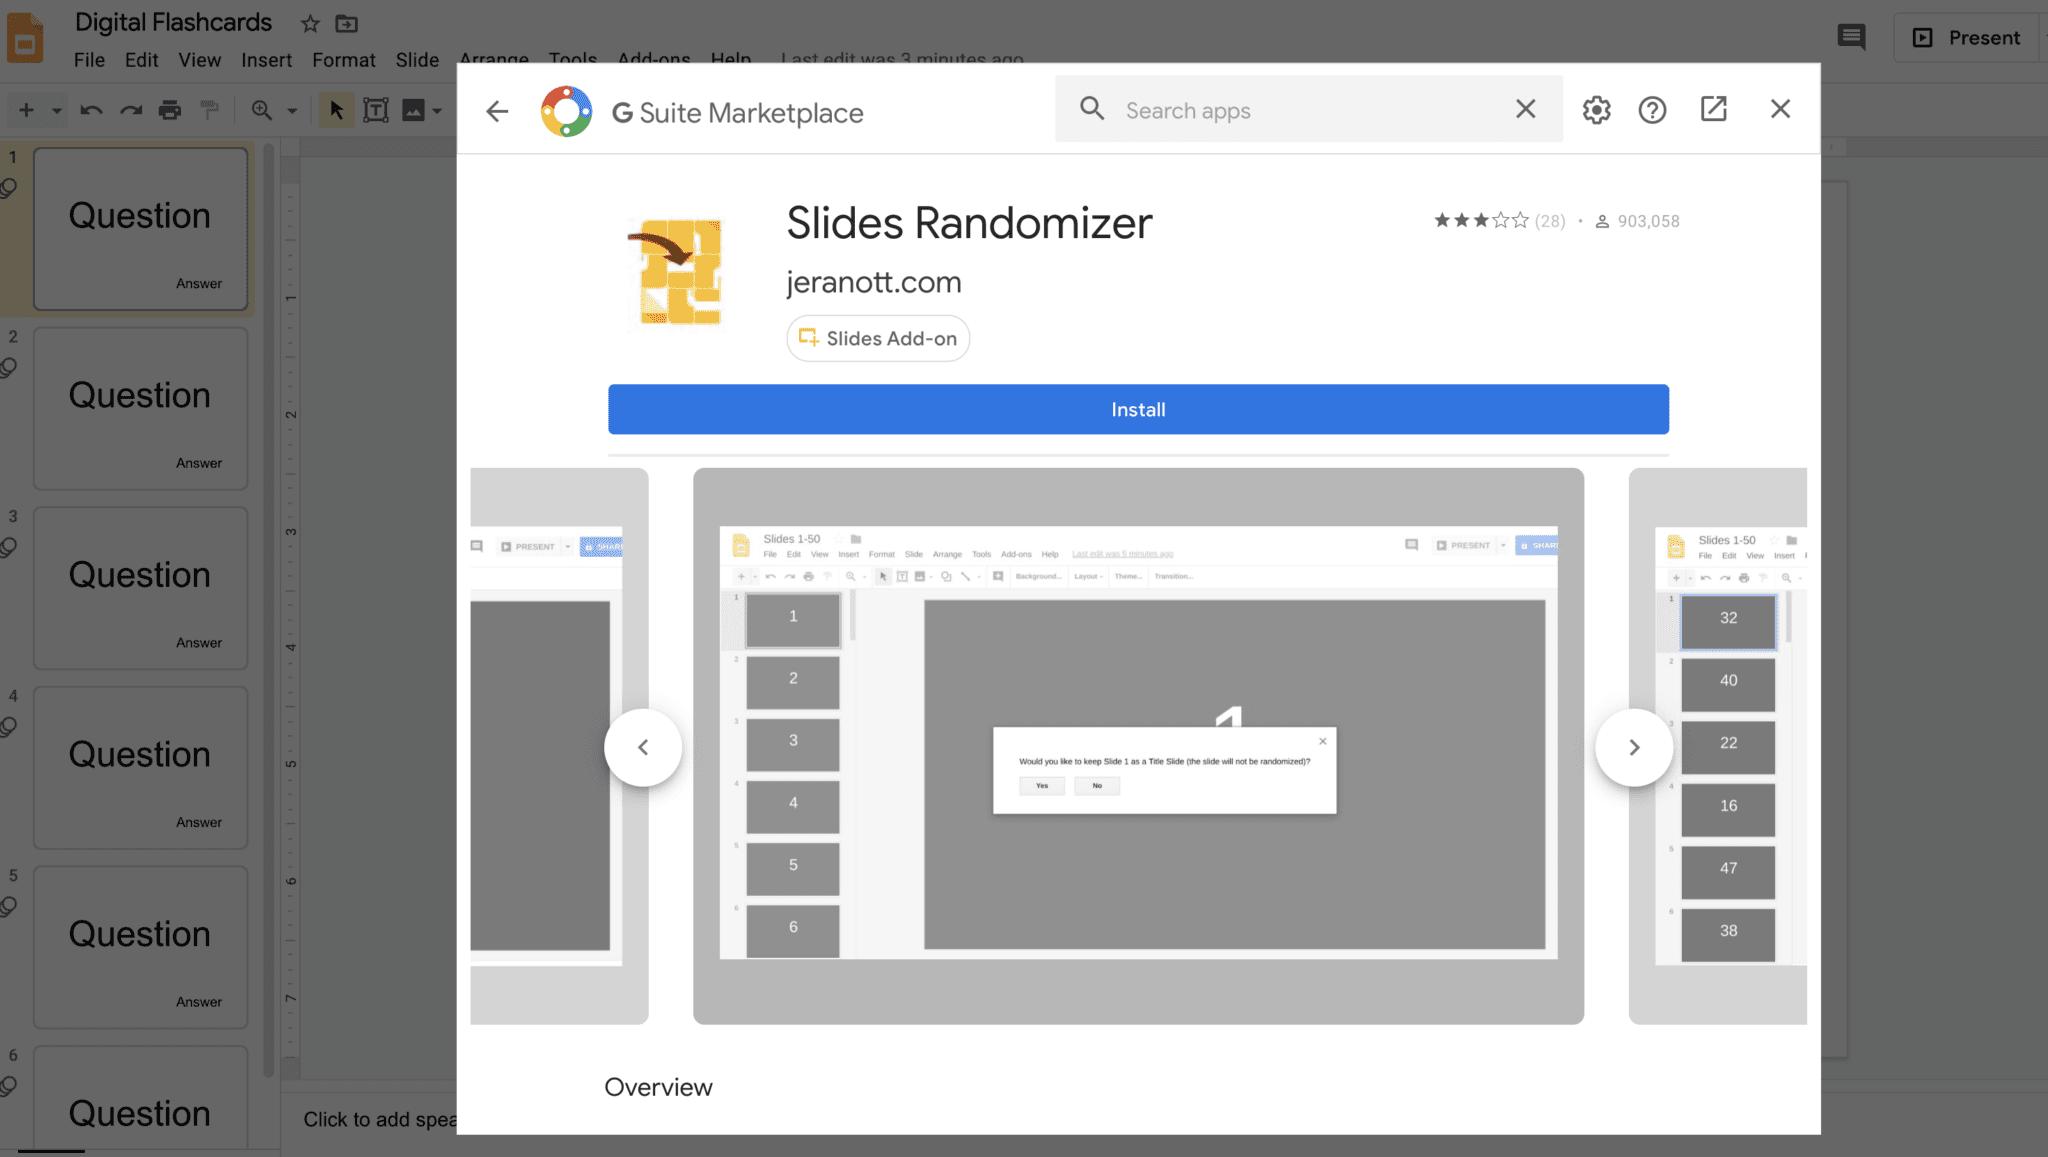 Slides Randomizer Digital Flashcards